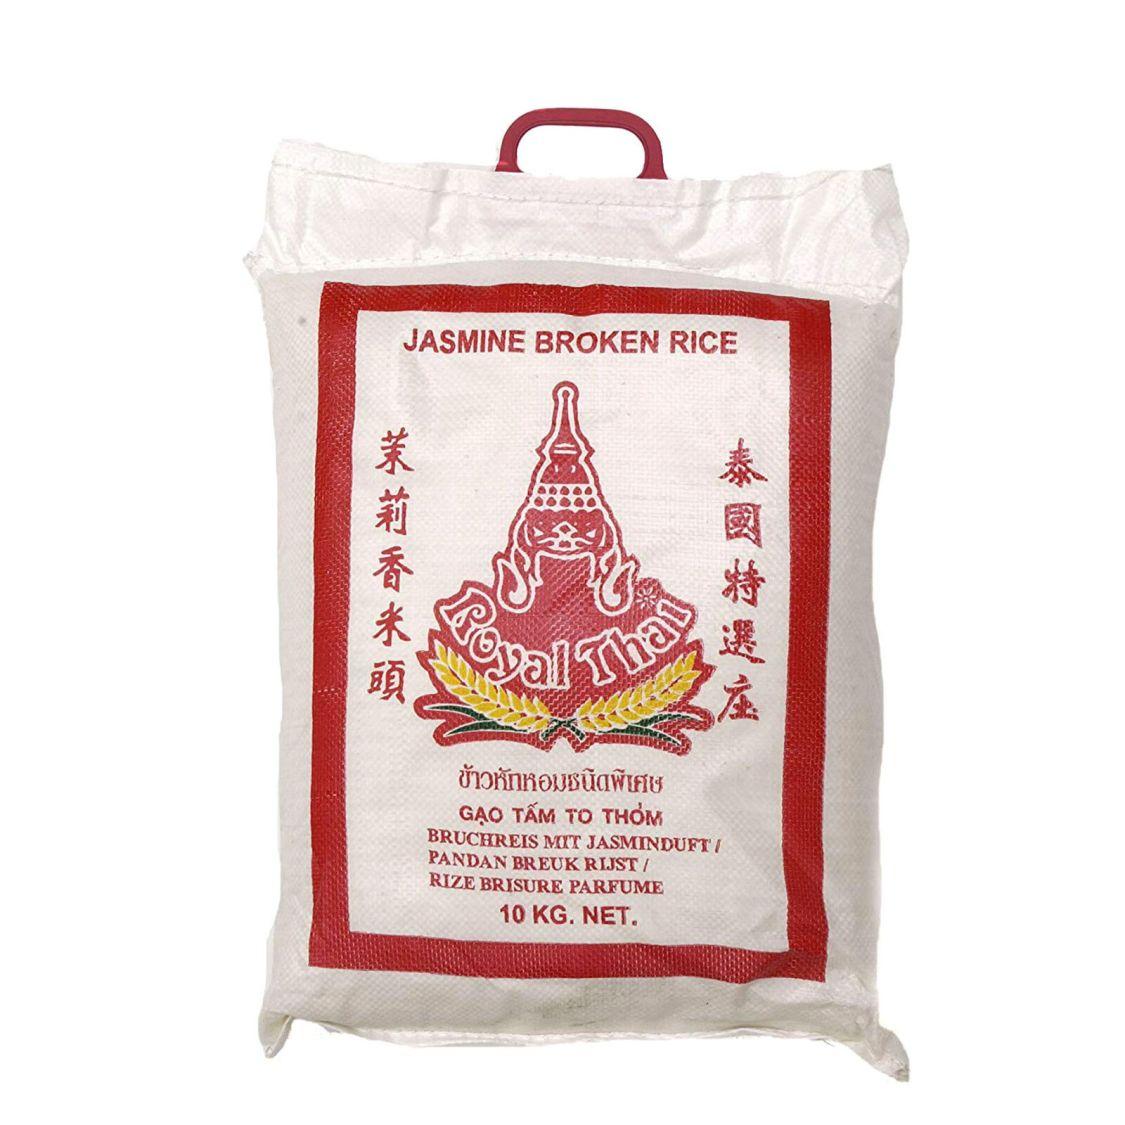 10 Kilo Royal Thai Bruchreis Jasminreis Jasmine Broken Rice Thai Hom Mali Broken